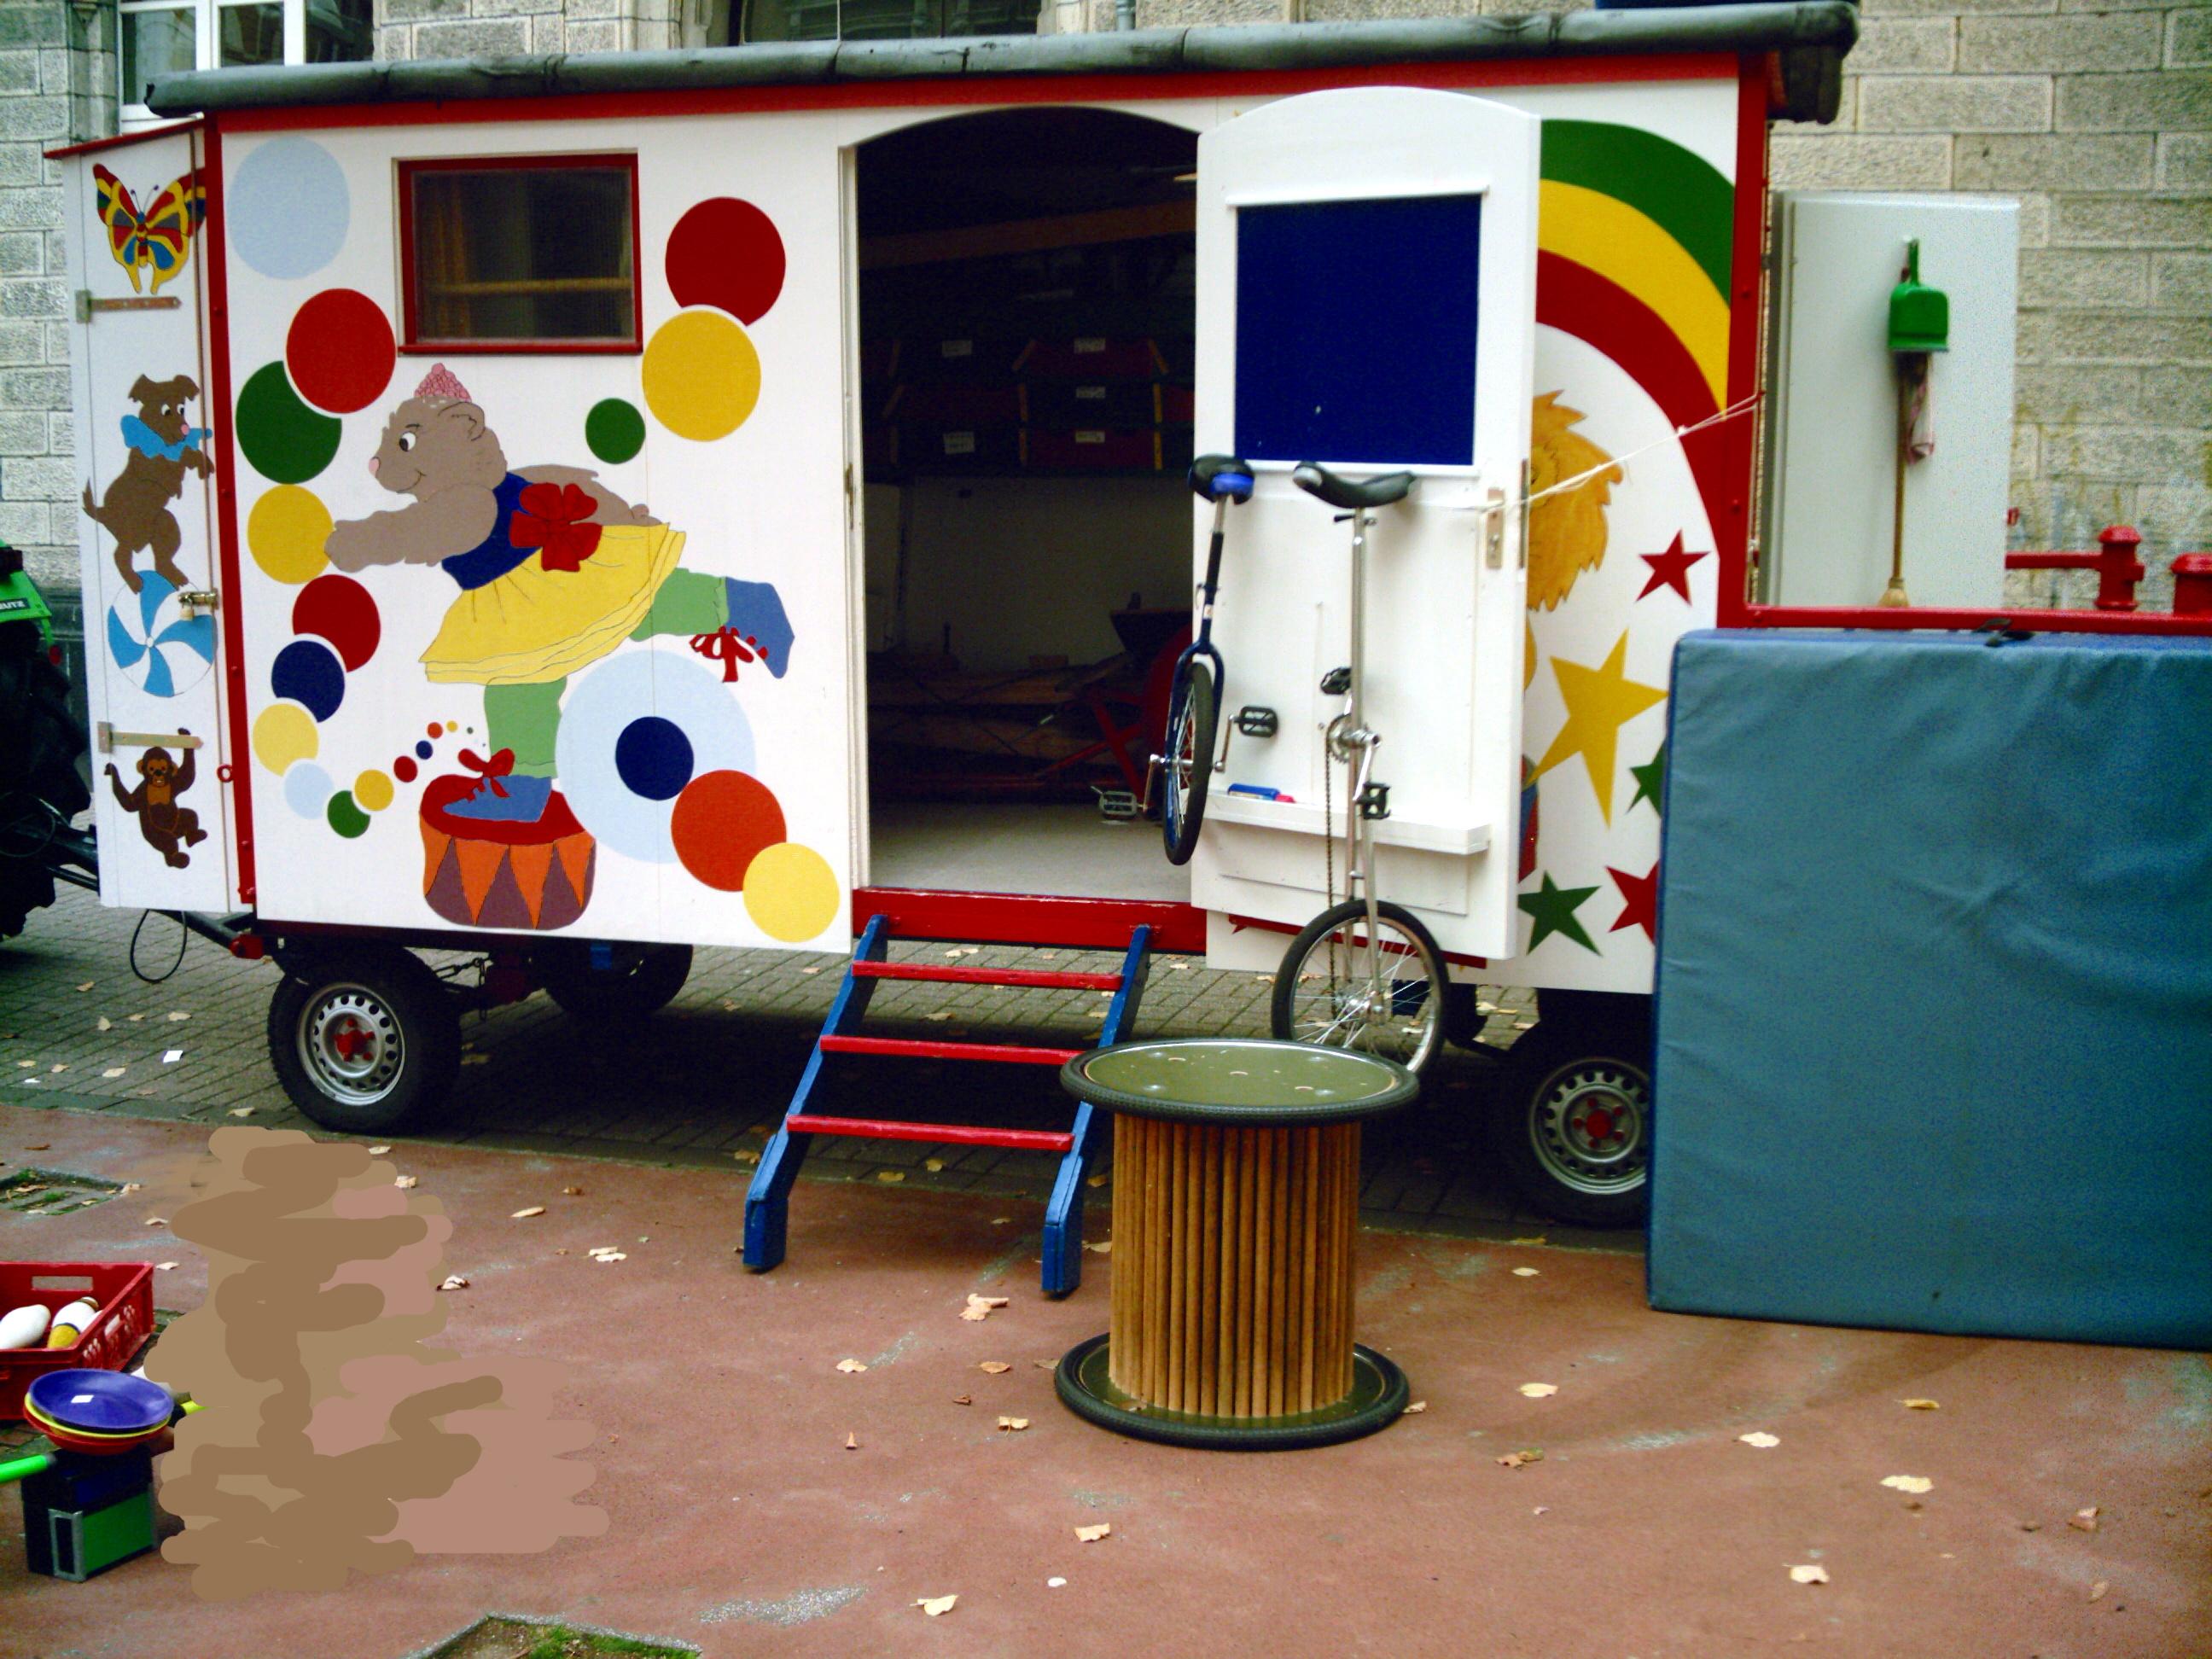 kreta die kreative einrichtung zirkus. Black Bedroom Furniture Sets. Home Design Ideas